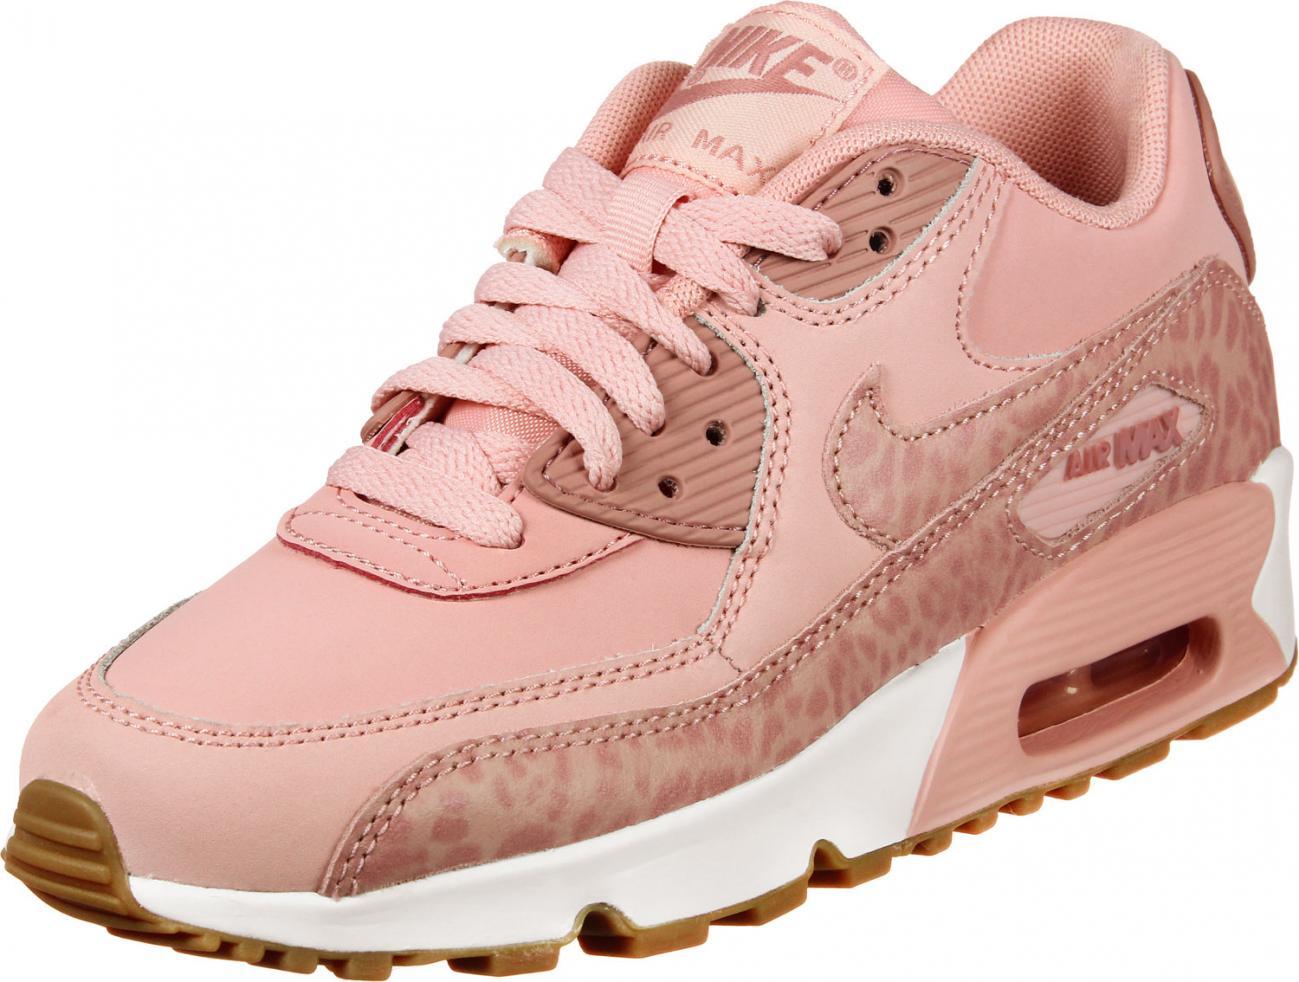 air max 90 rose et verte femme,Nike Air max 90 femme blanc rose ...